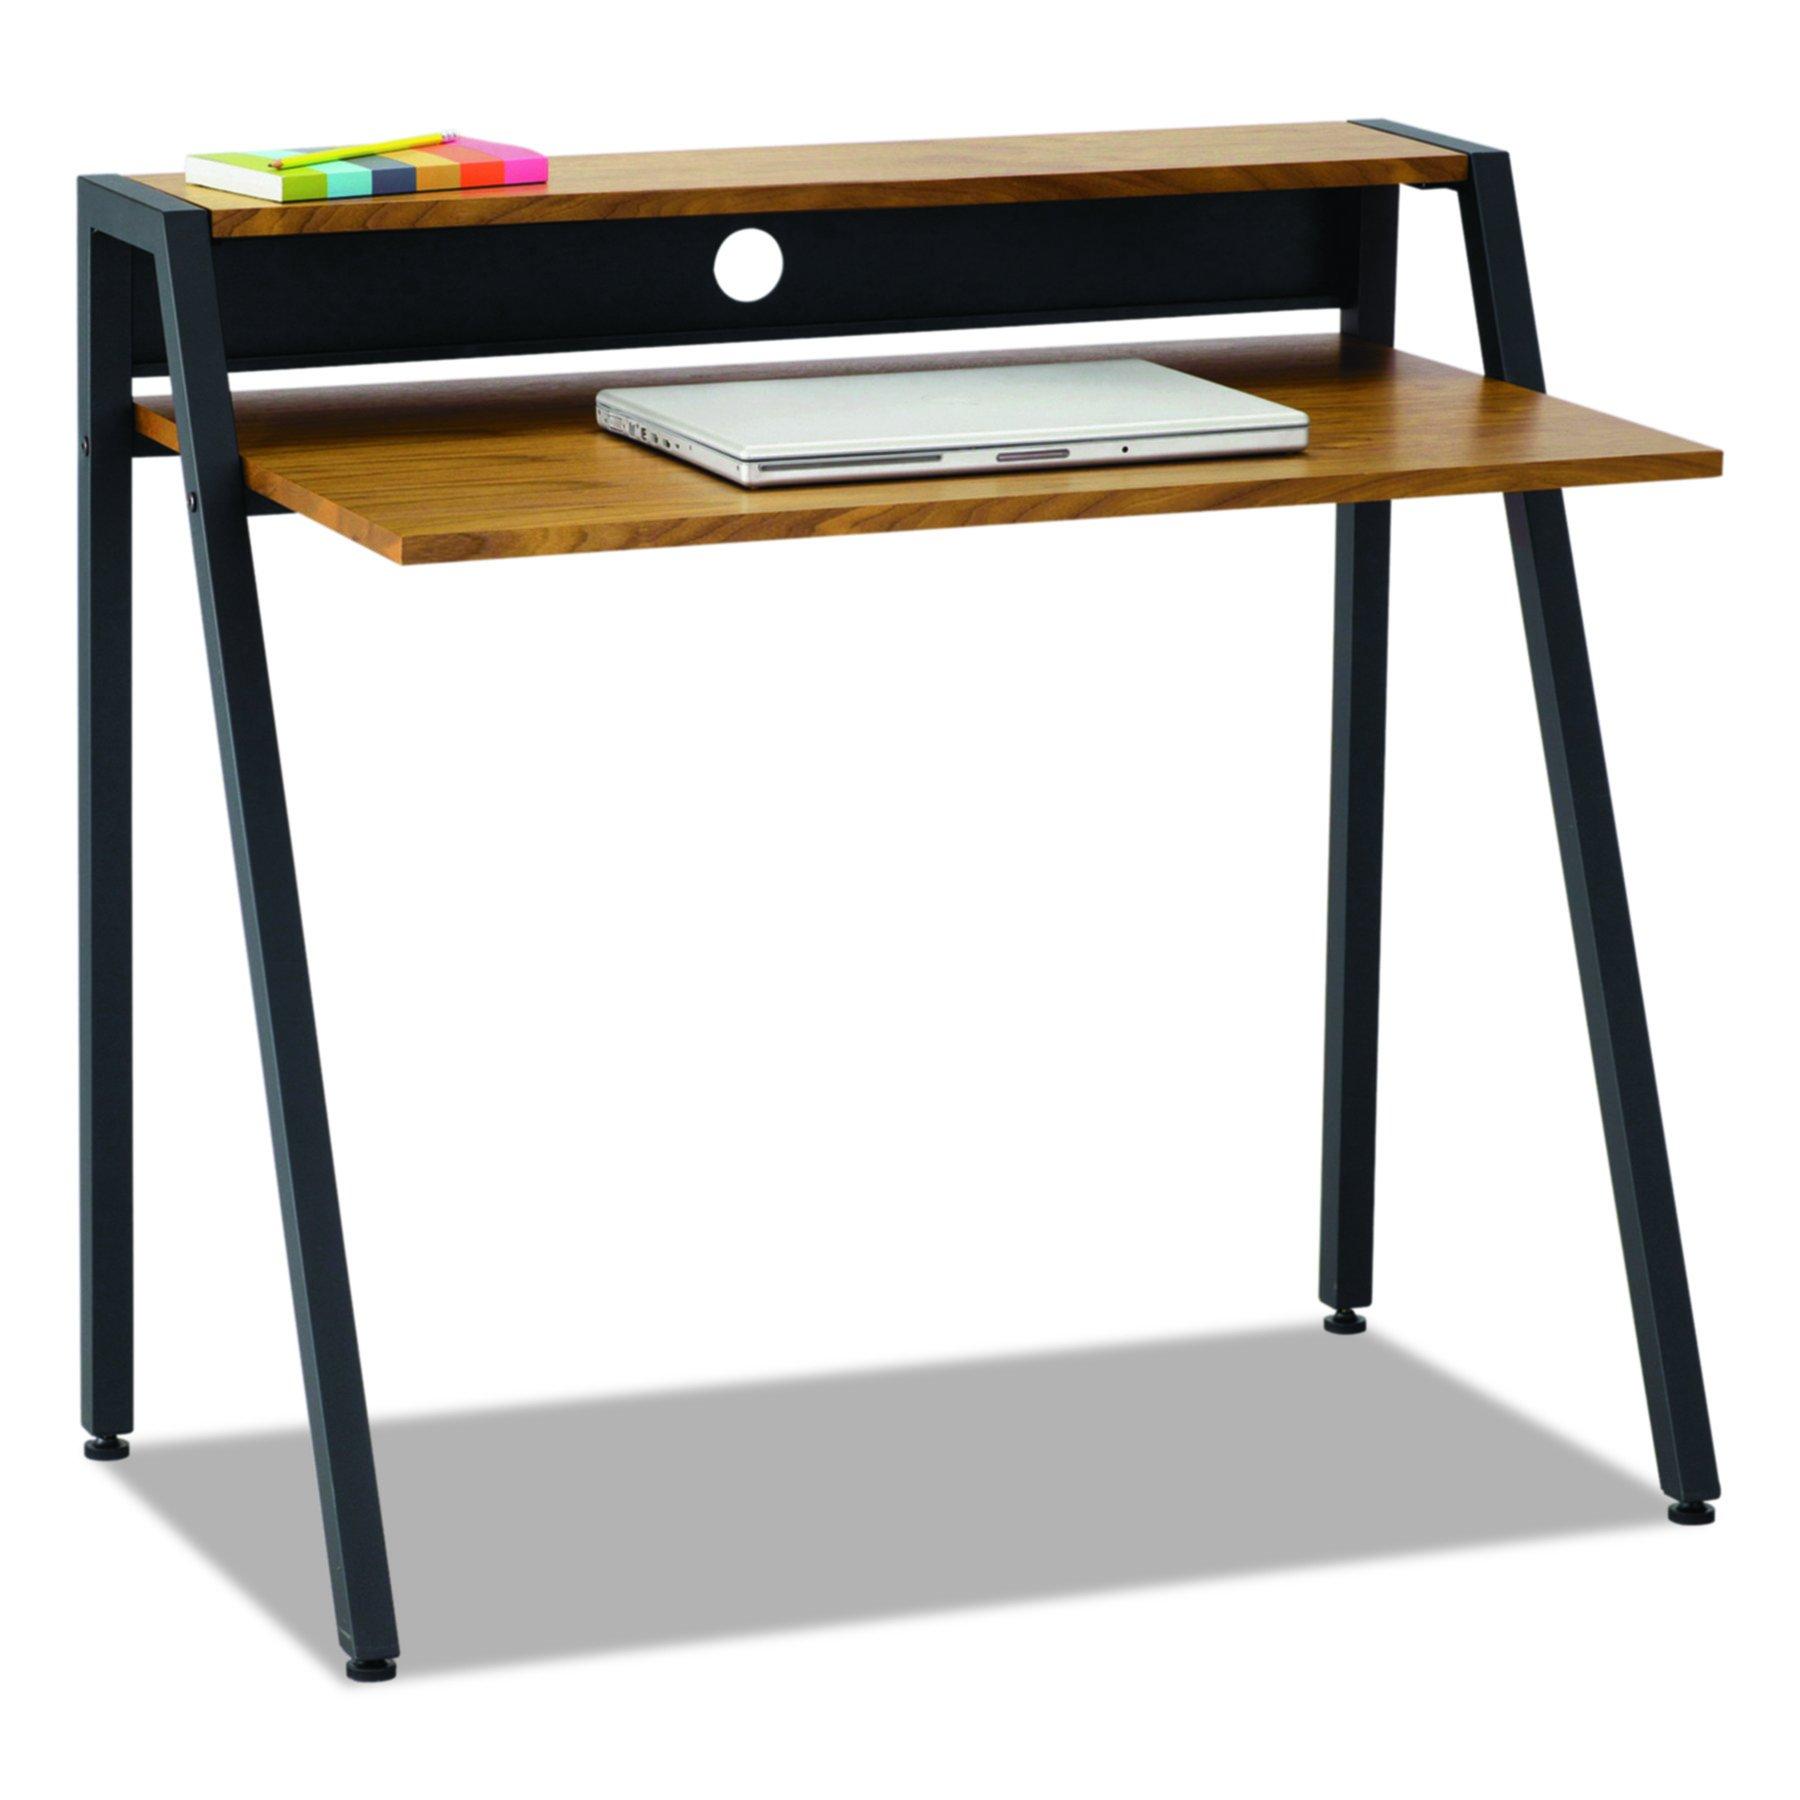 Safco Products 1951BL Studio Writing Desk, Black